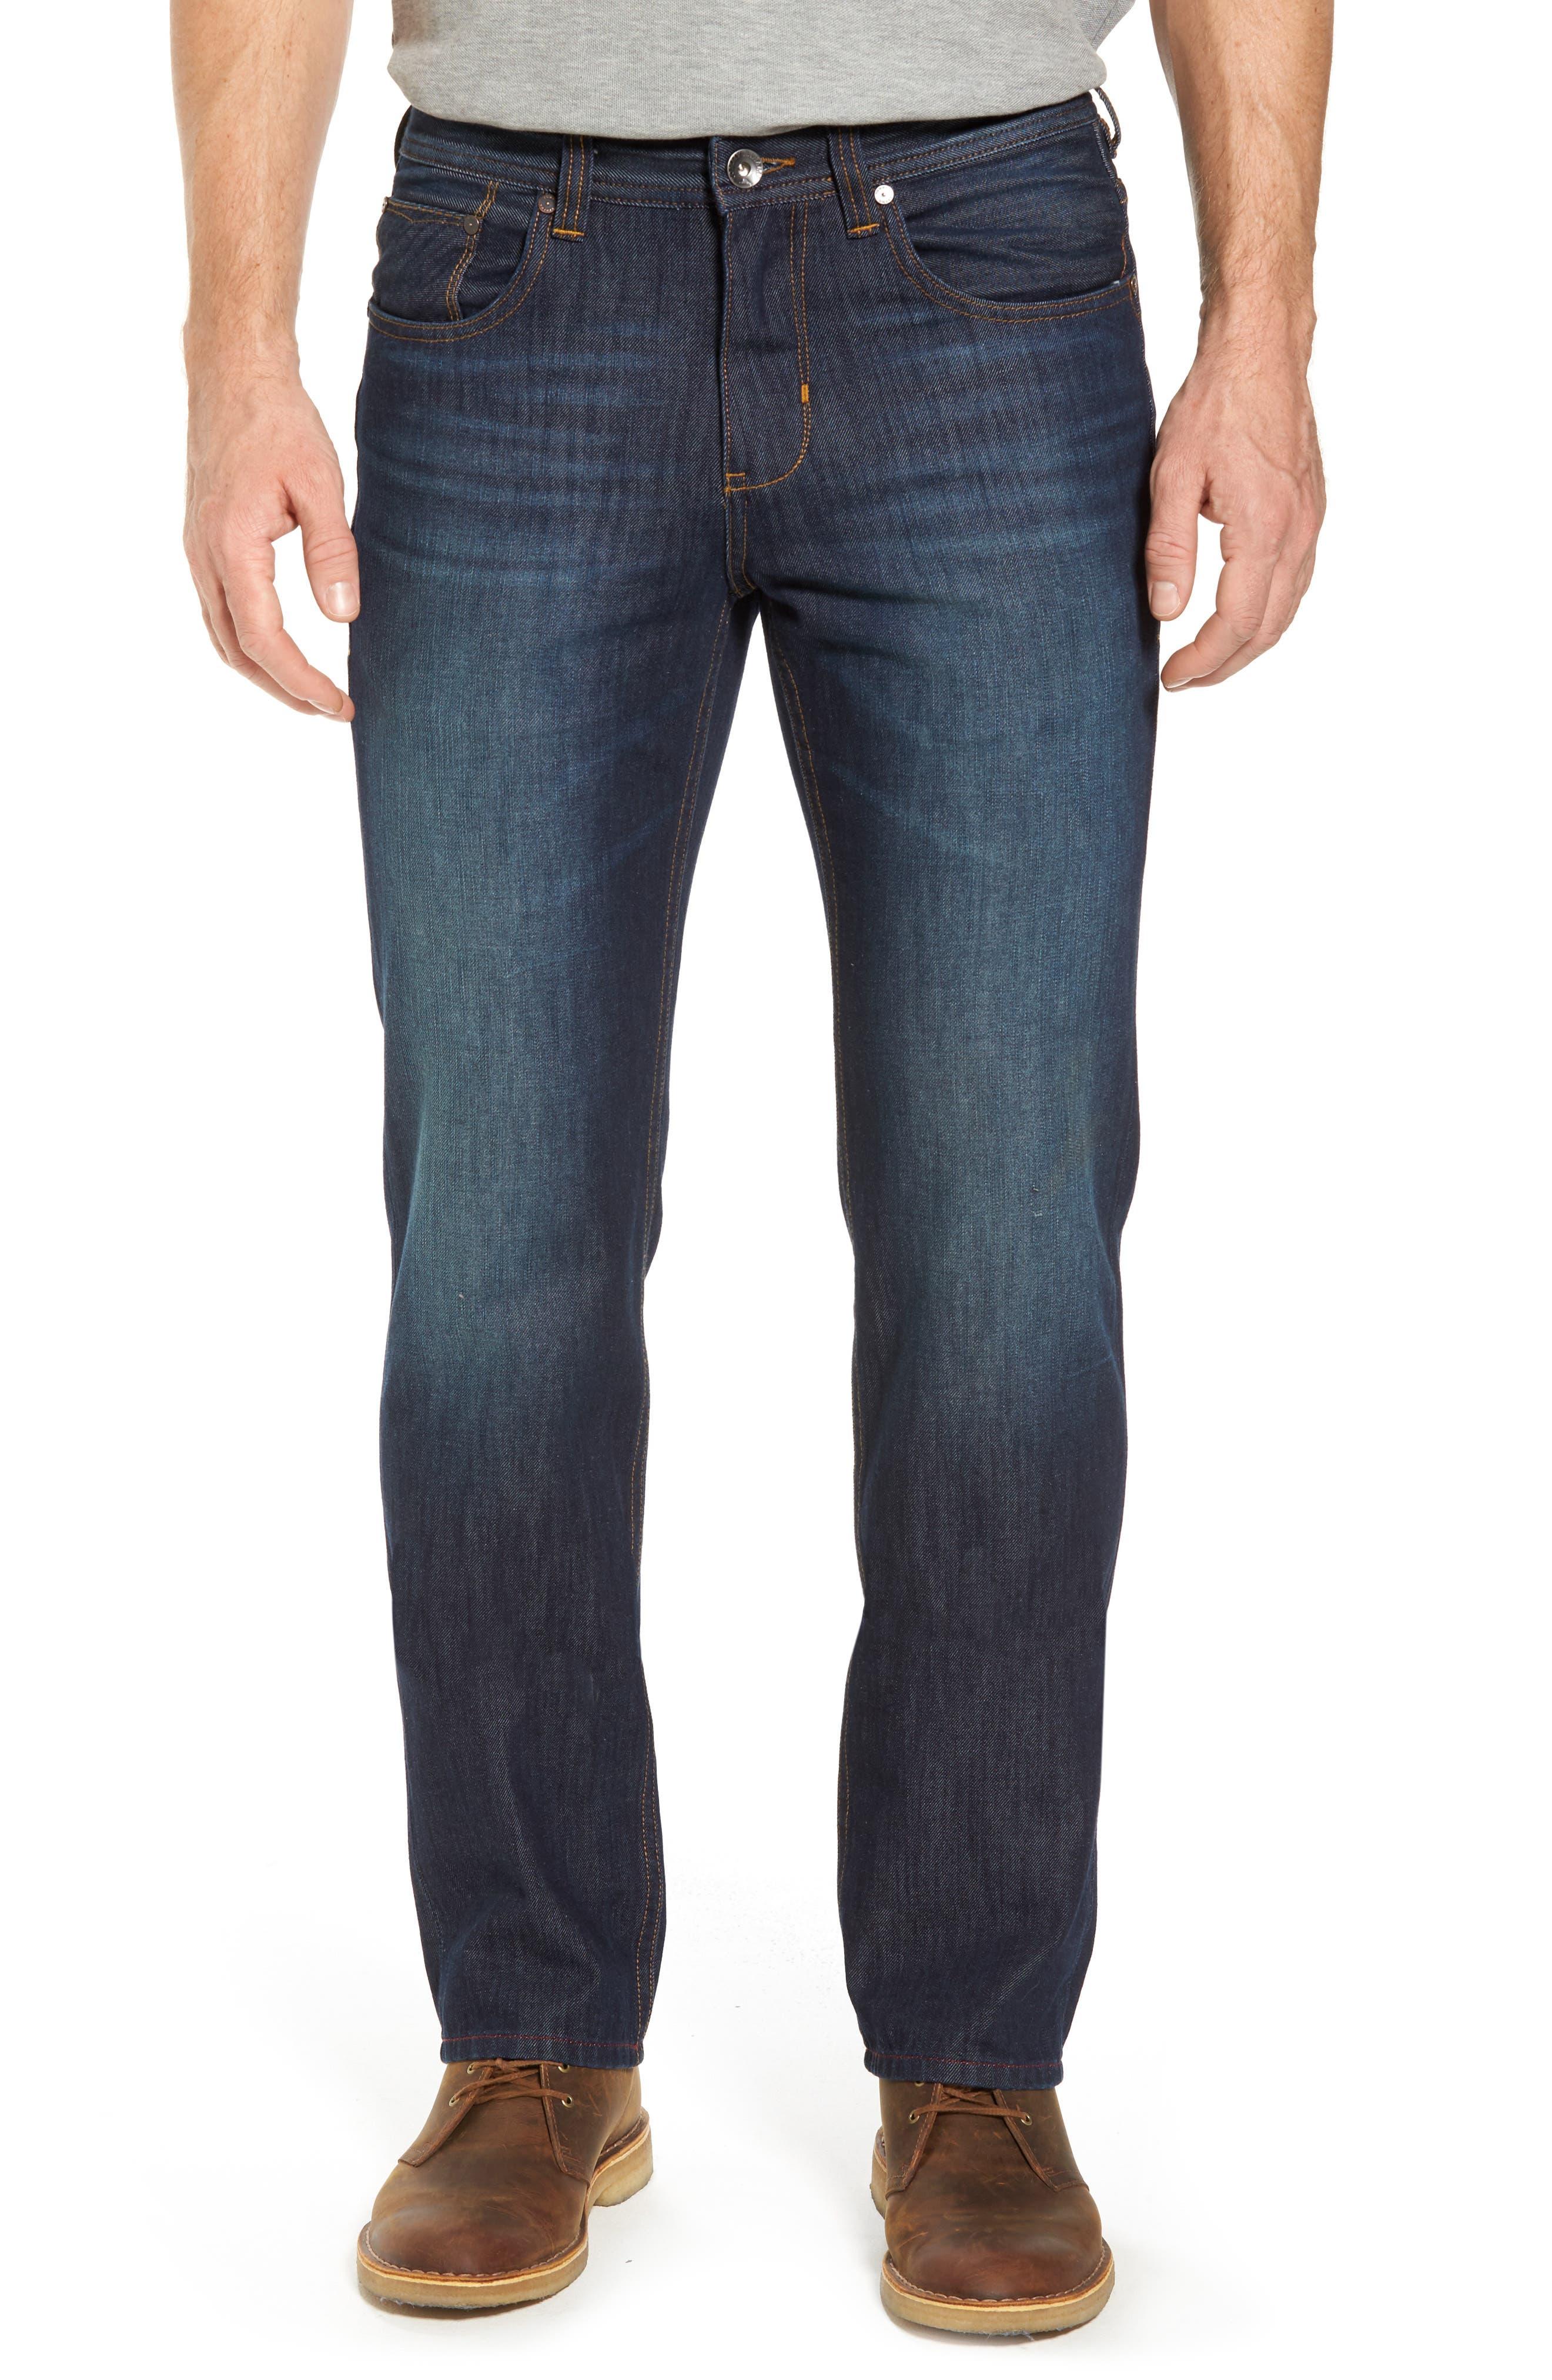 Alternate Image 1 Selected - Tommy Bahama Bardabos Straight Leg Jeans